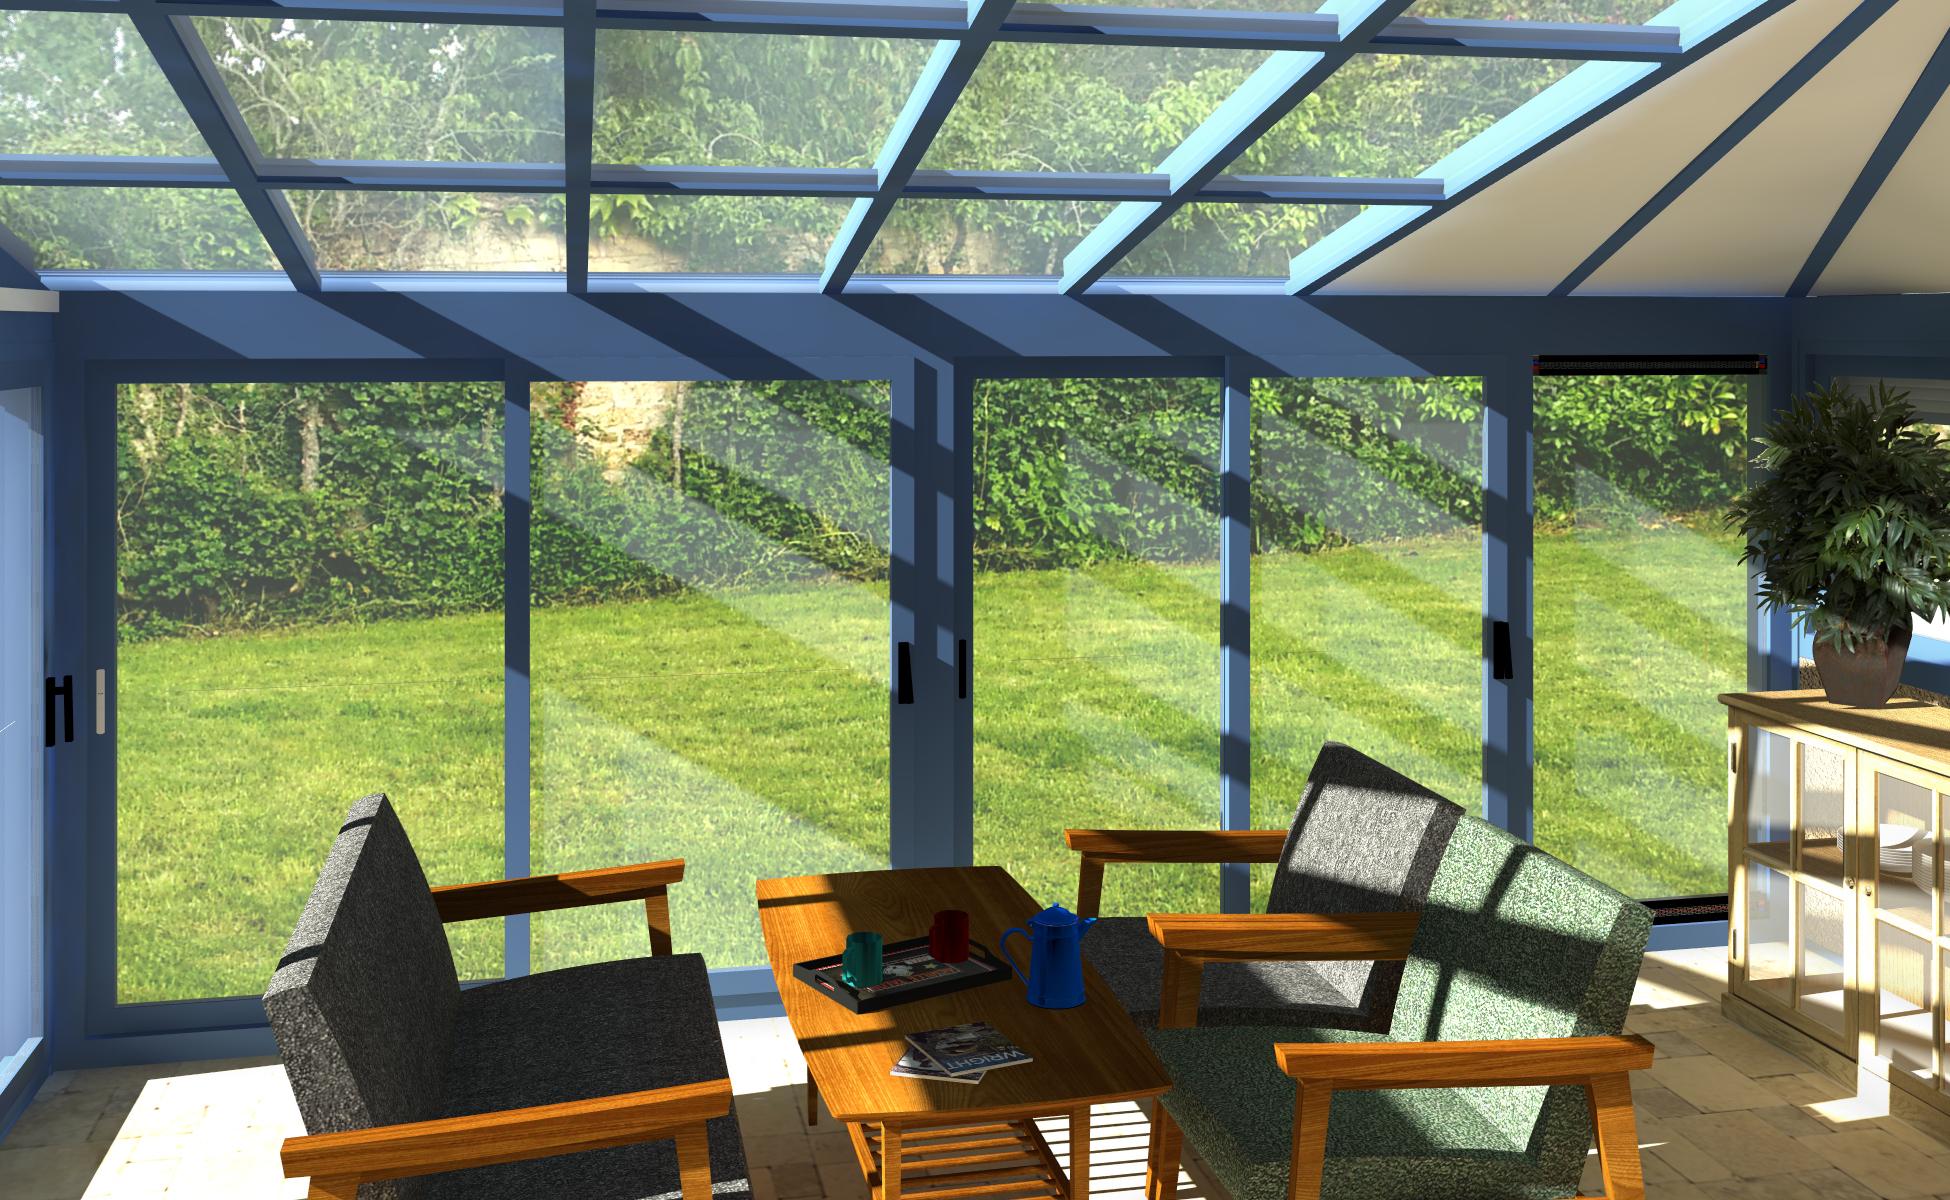 image veranda 2 avec rendu